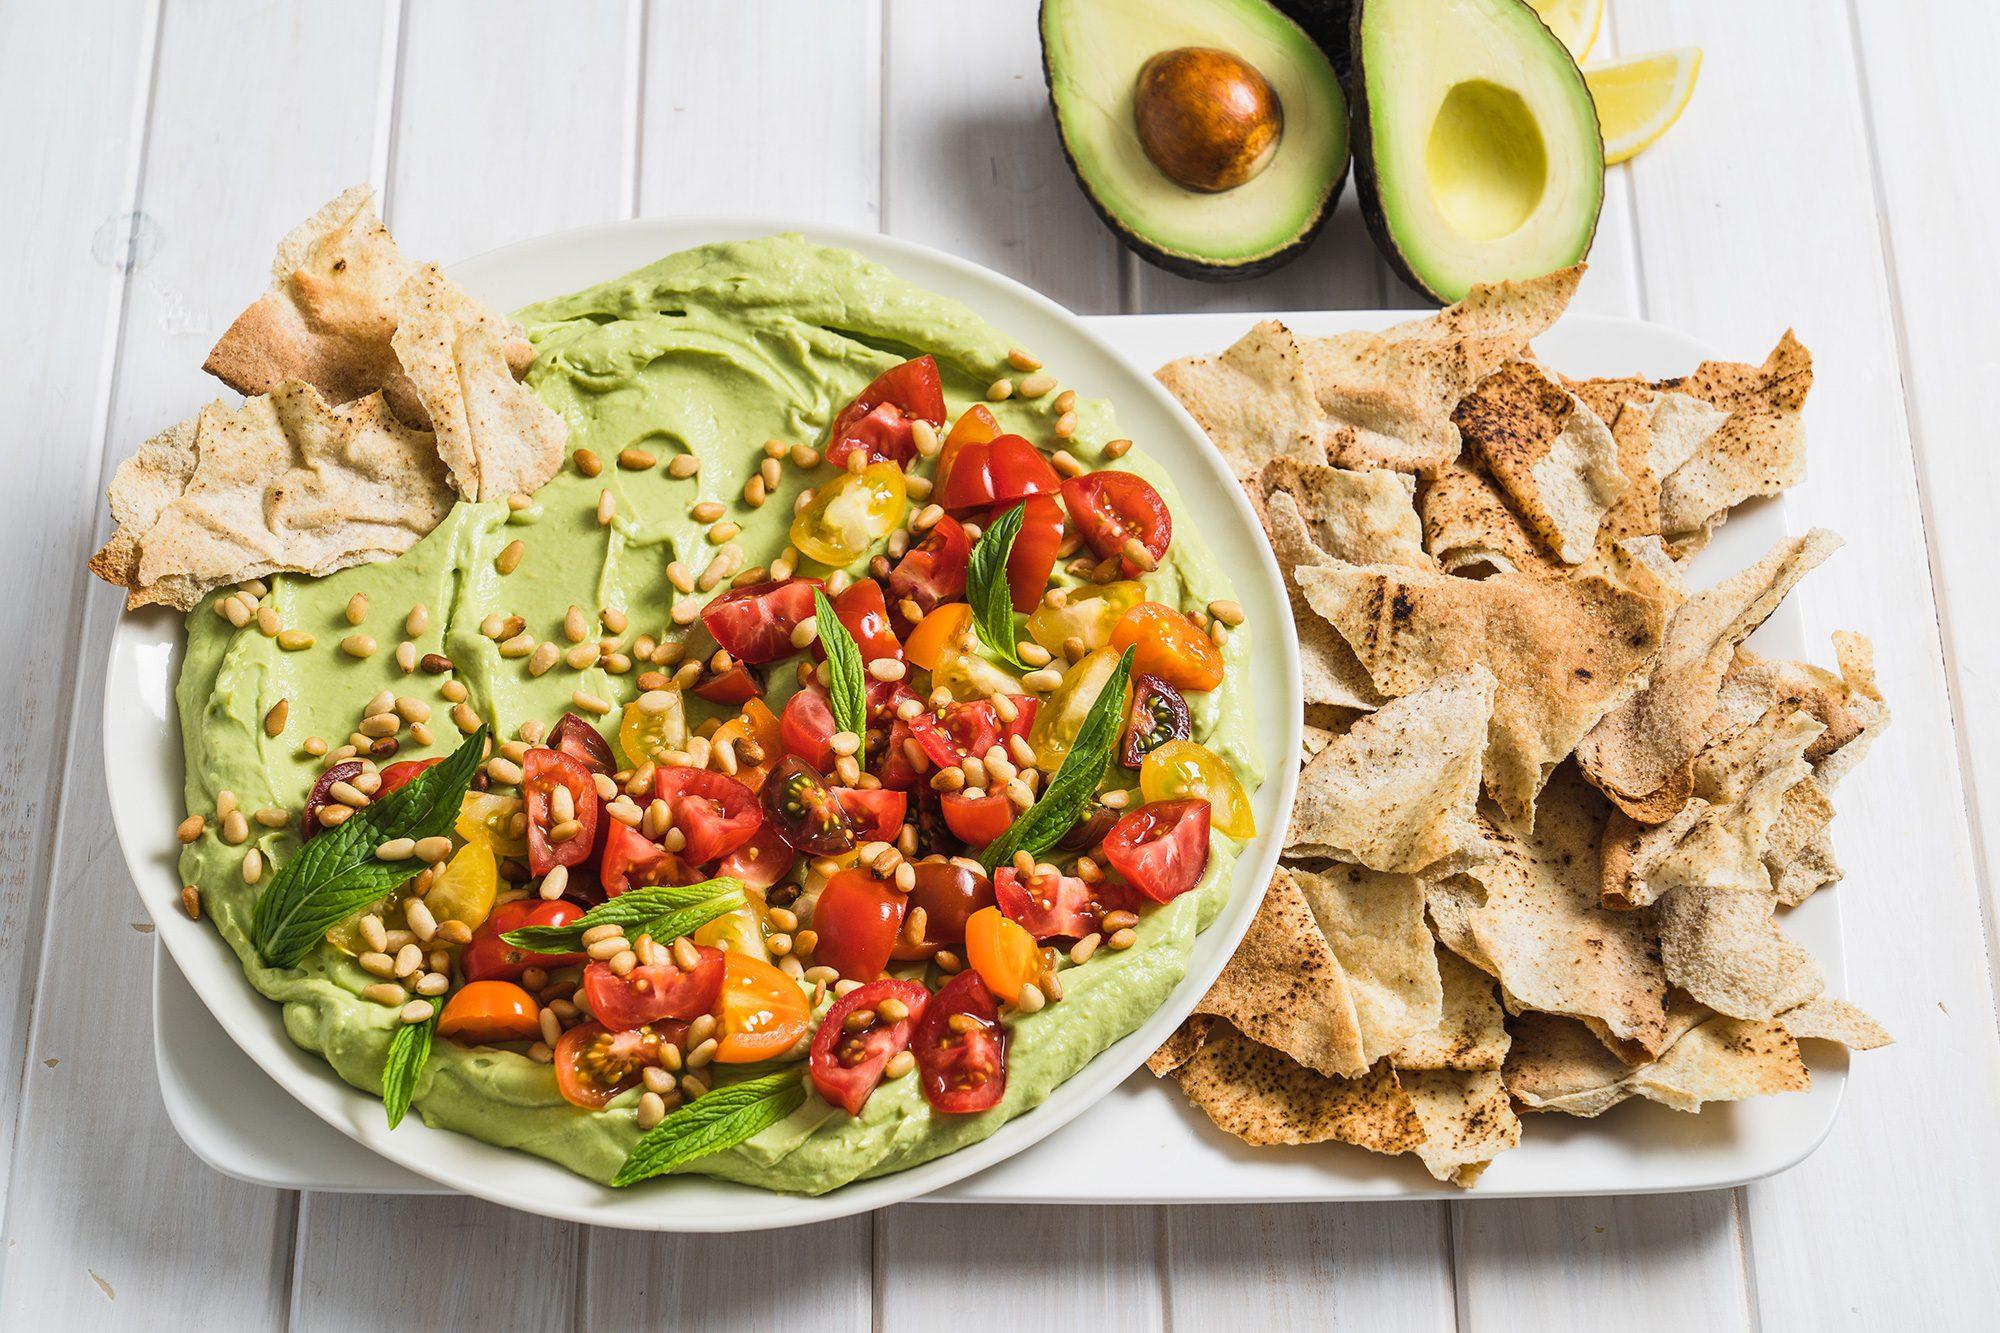 The Ultimate Avocado Entertaining Platter